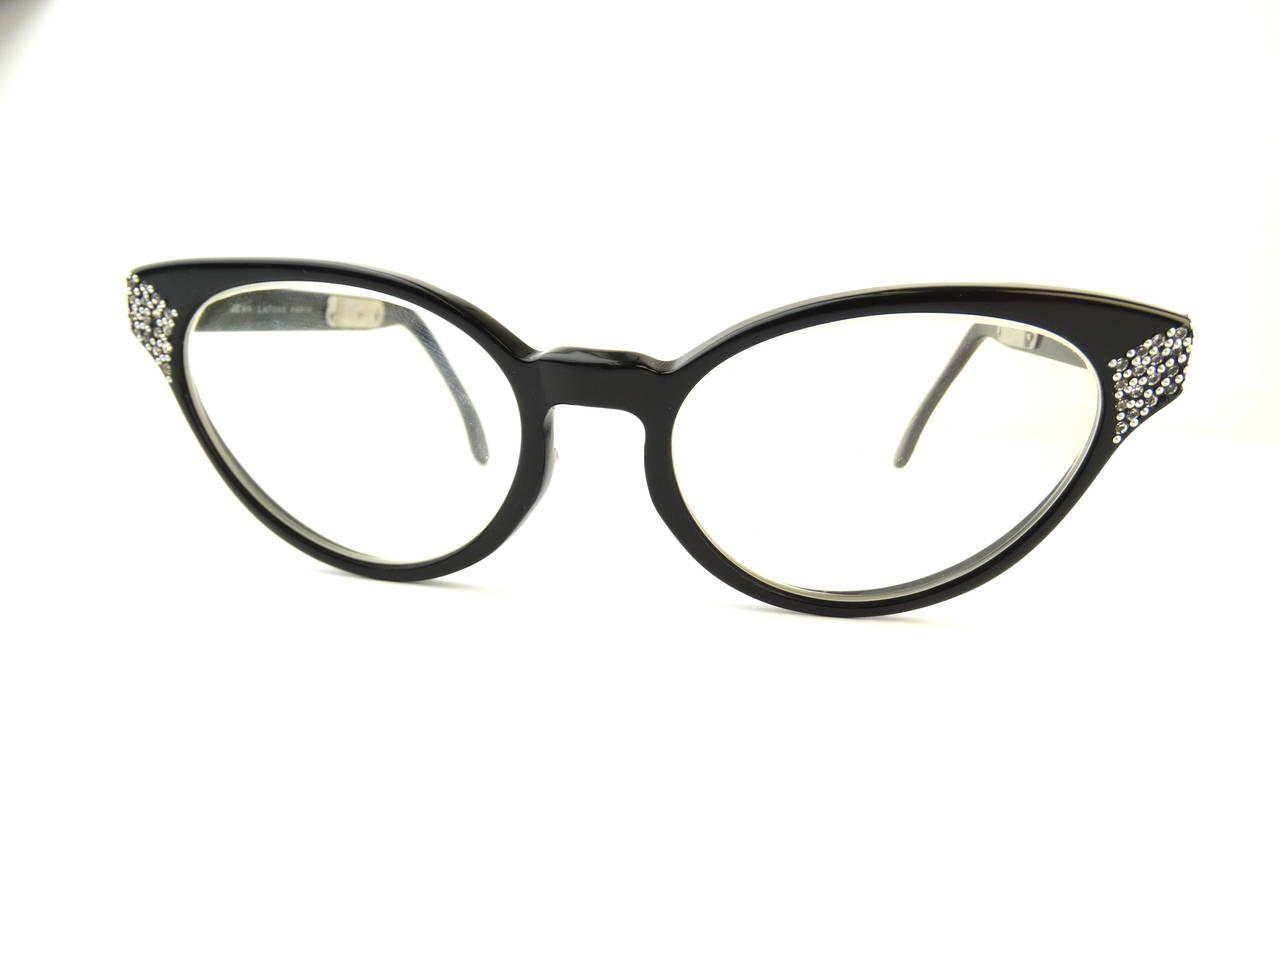 Jean lafont eyeglasses frames - 1960s Cateye Jean Lafont Black Rhinestone Eyeglasses